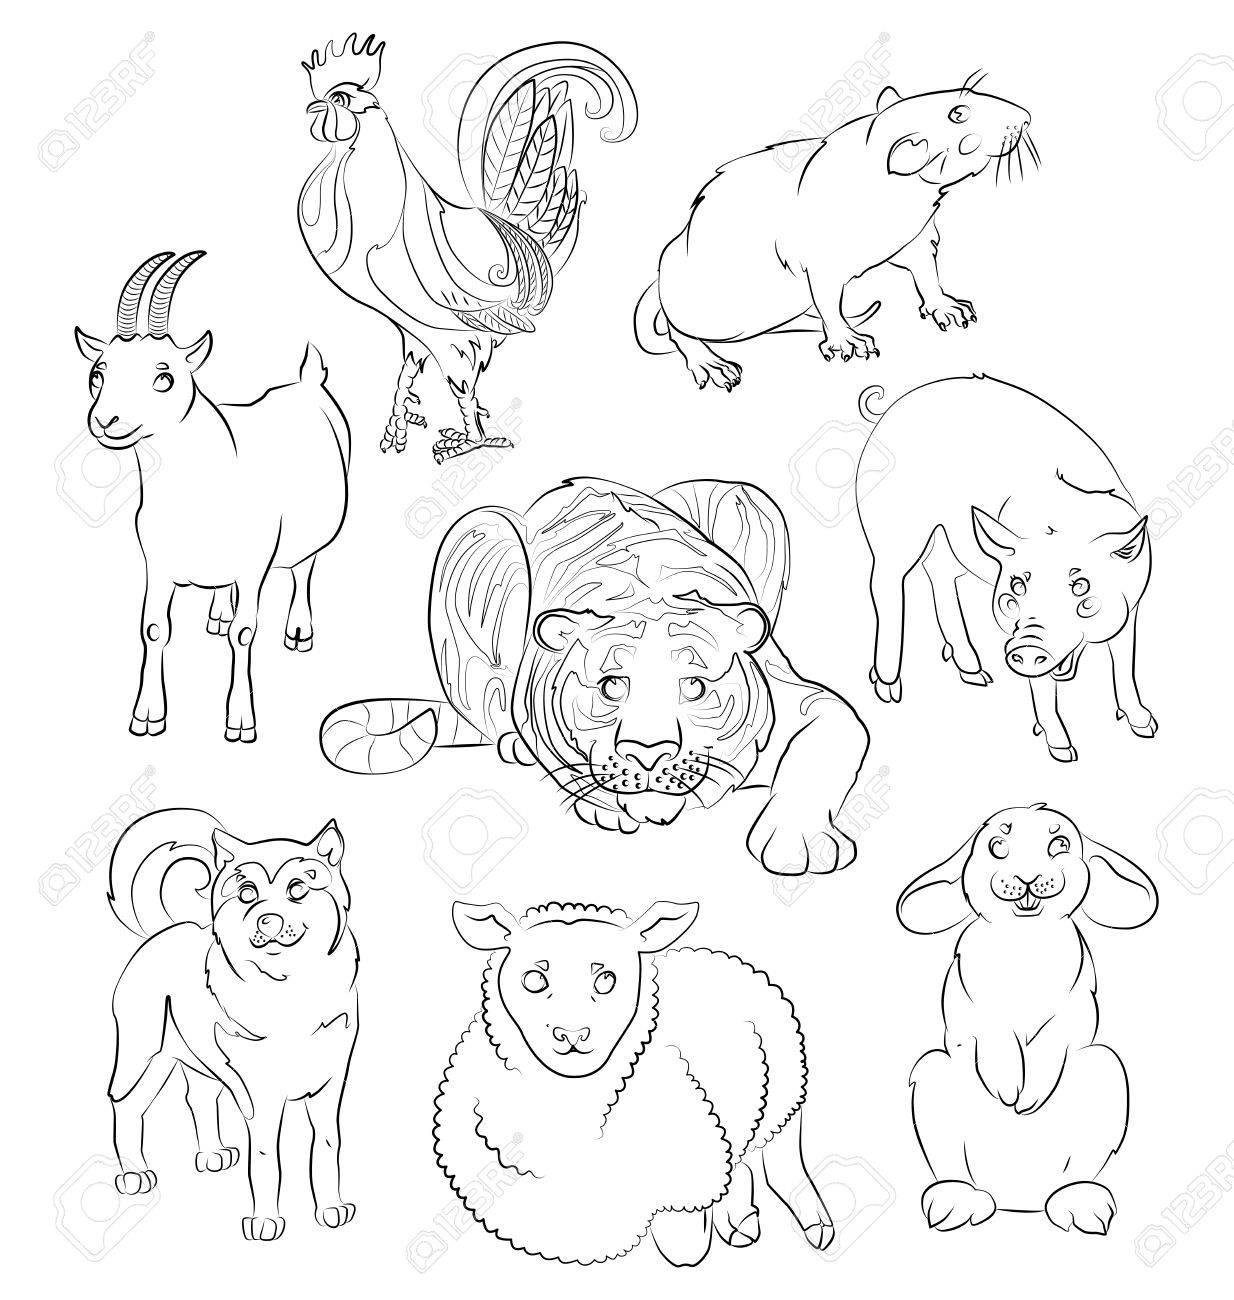 Parte Superior Dibujos De La Ratita Presumida Para Colorear E Imprimir